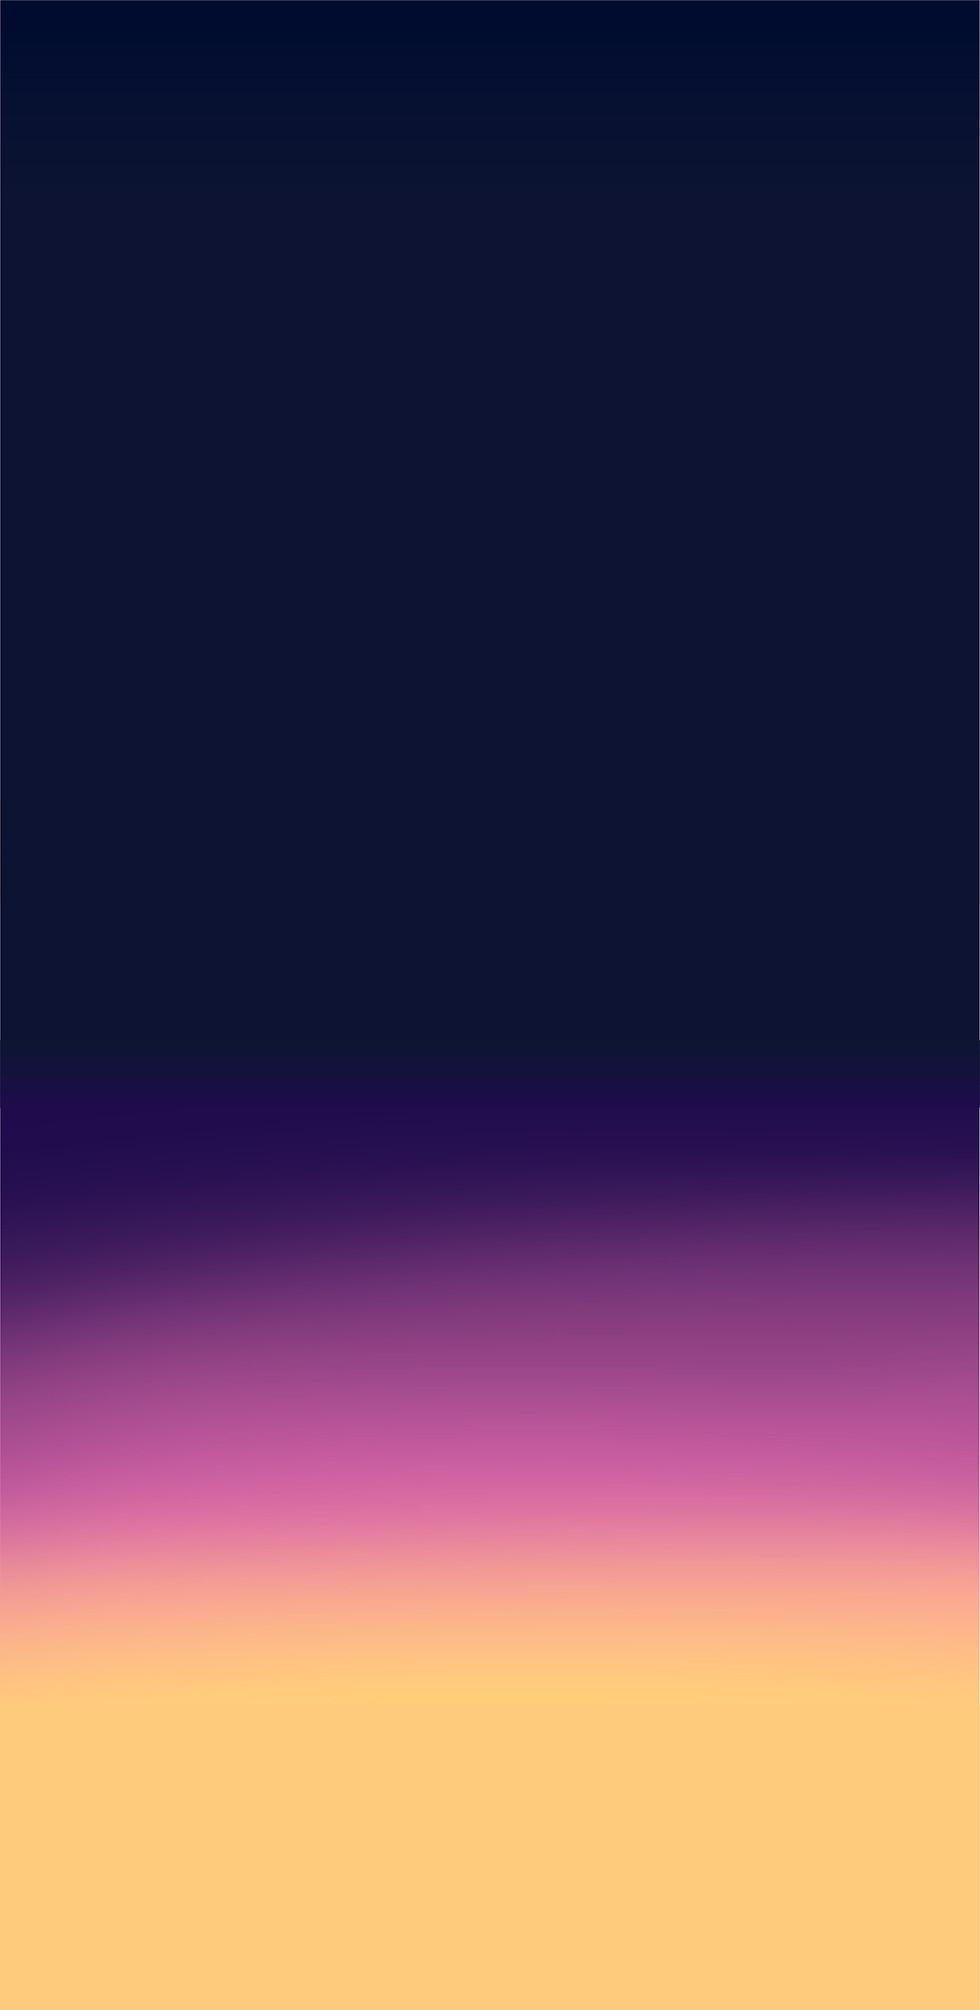 Background-07.jpg